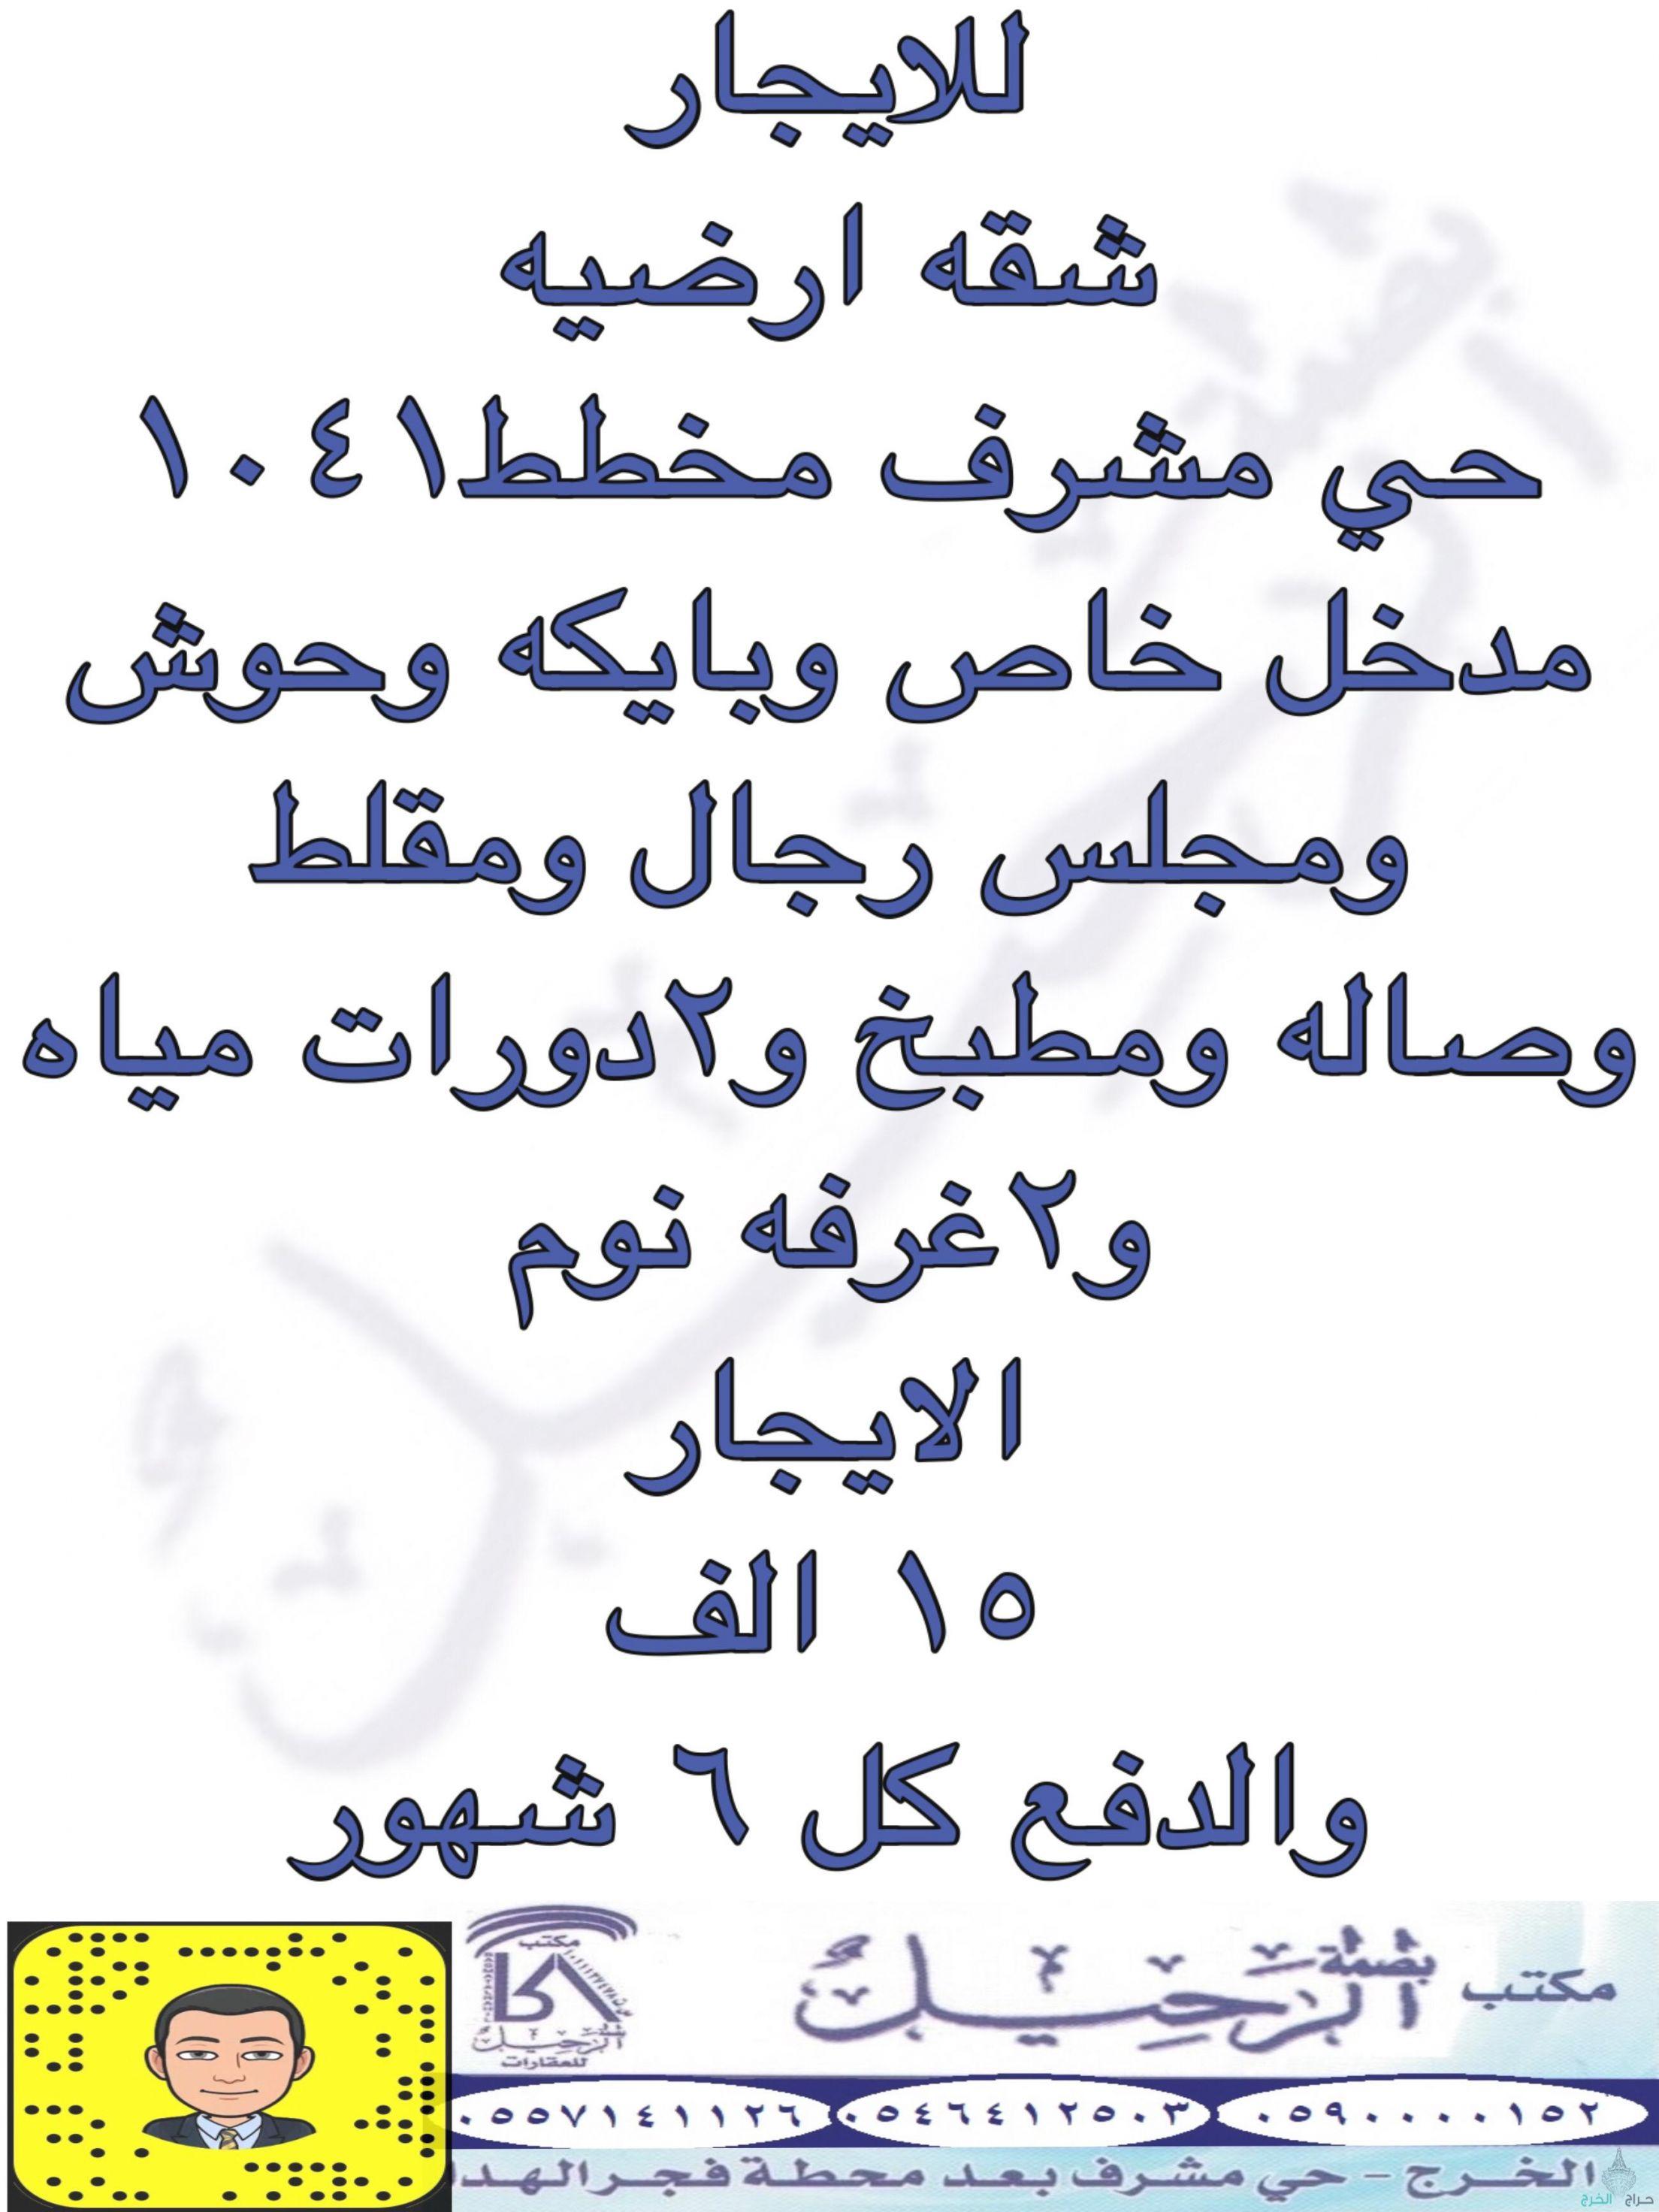 للايجار شقه ارضيه حي مشرف مخطط ١٠٤١